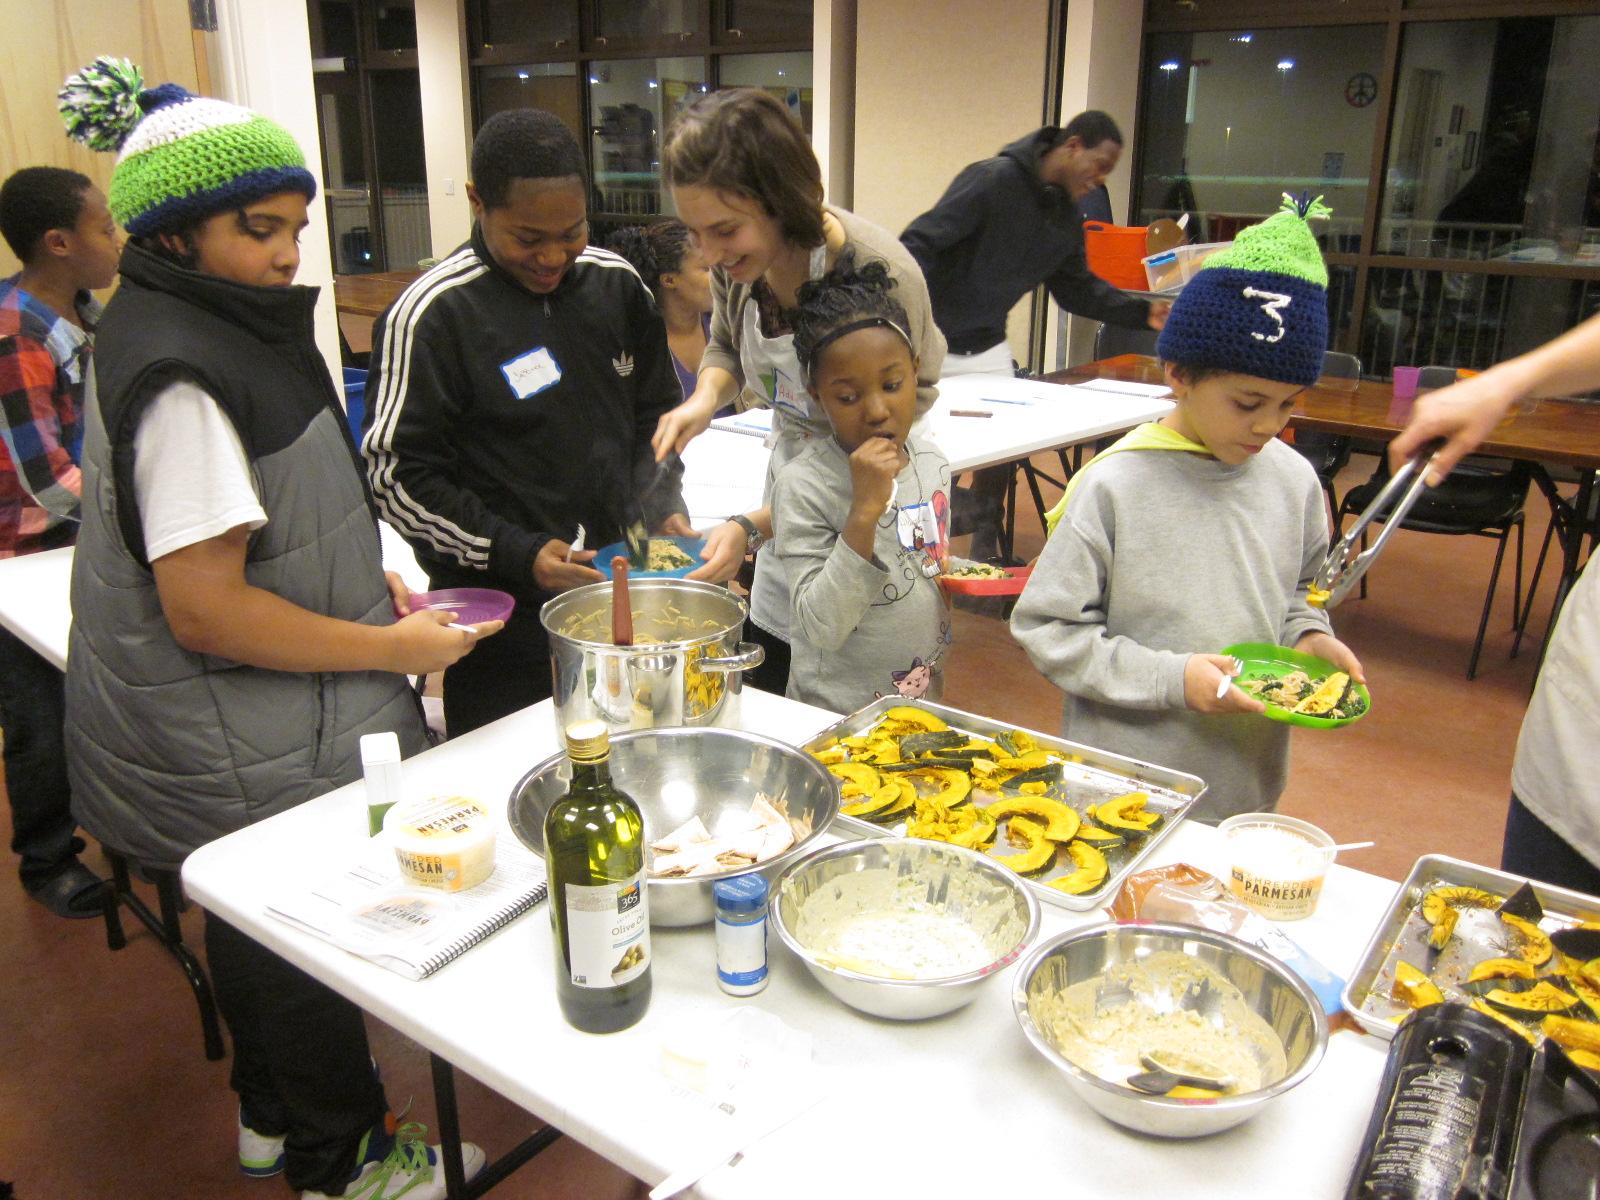 Cooking Matter class at Brettler Family Place